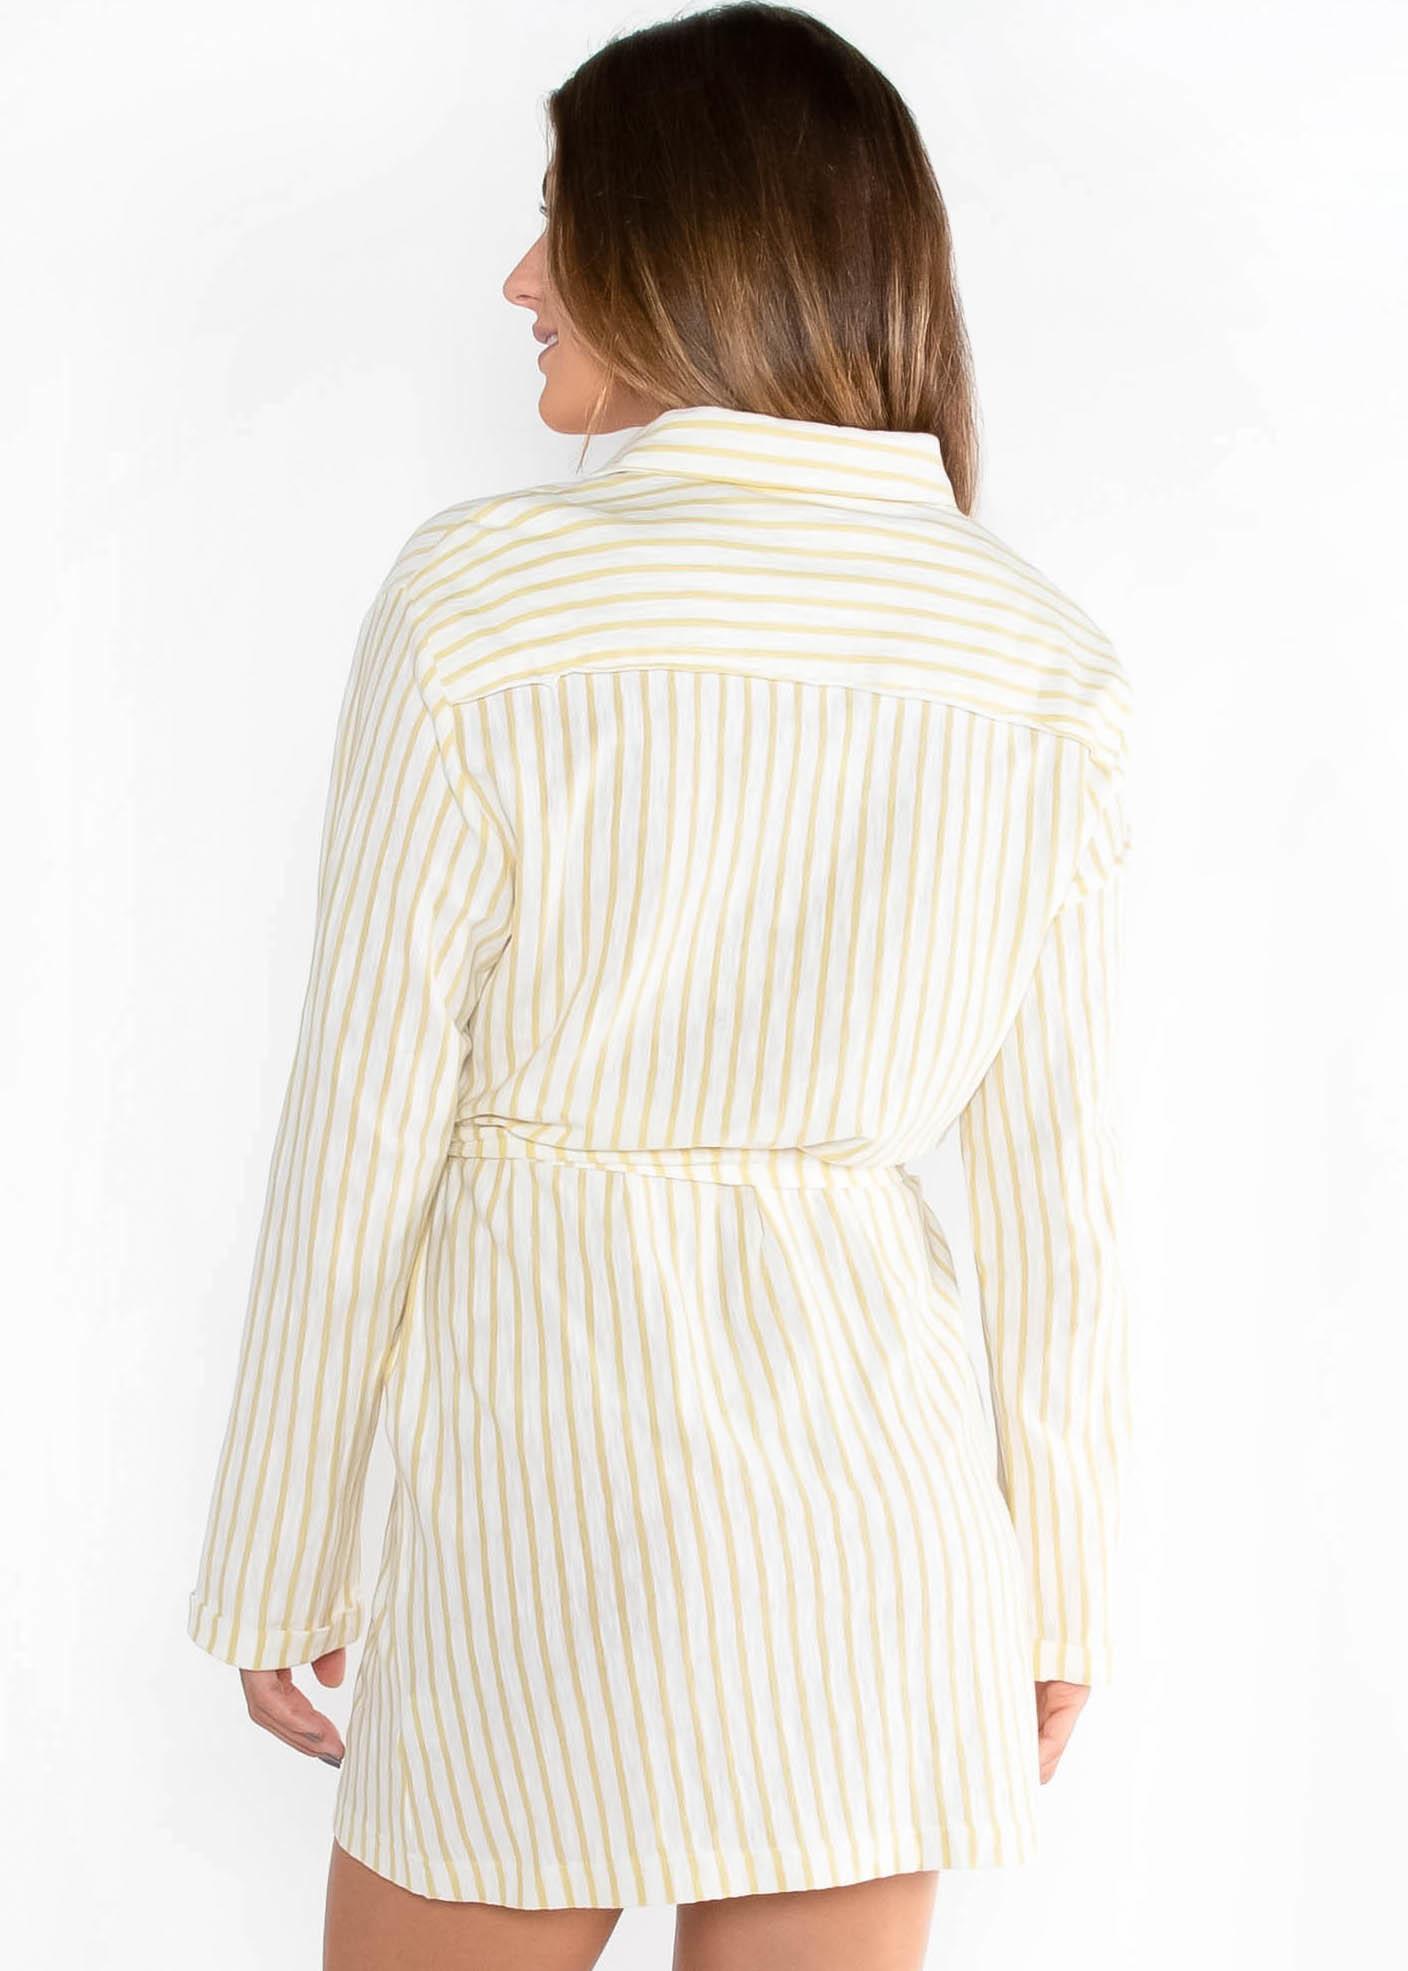 HONEYSUCKLE STRIPED DRESS